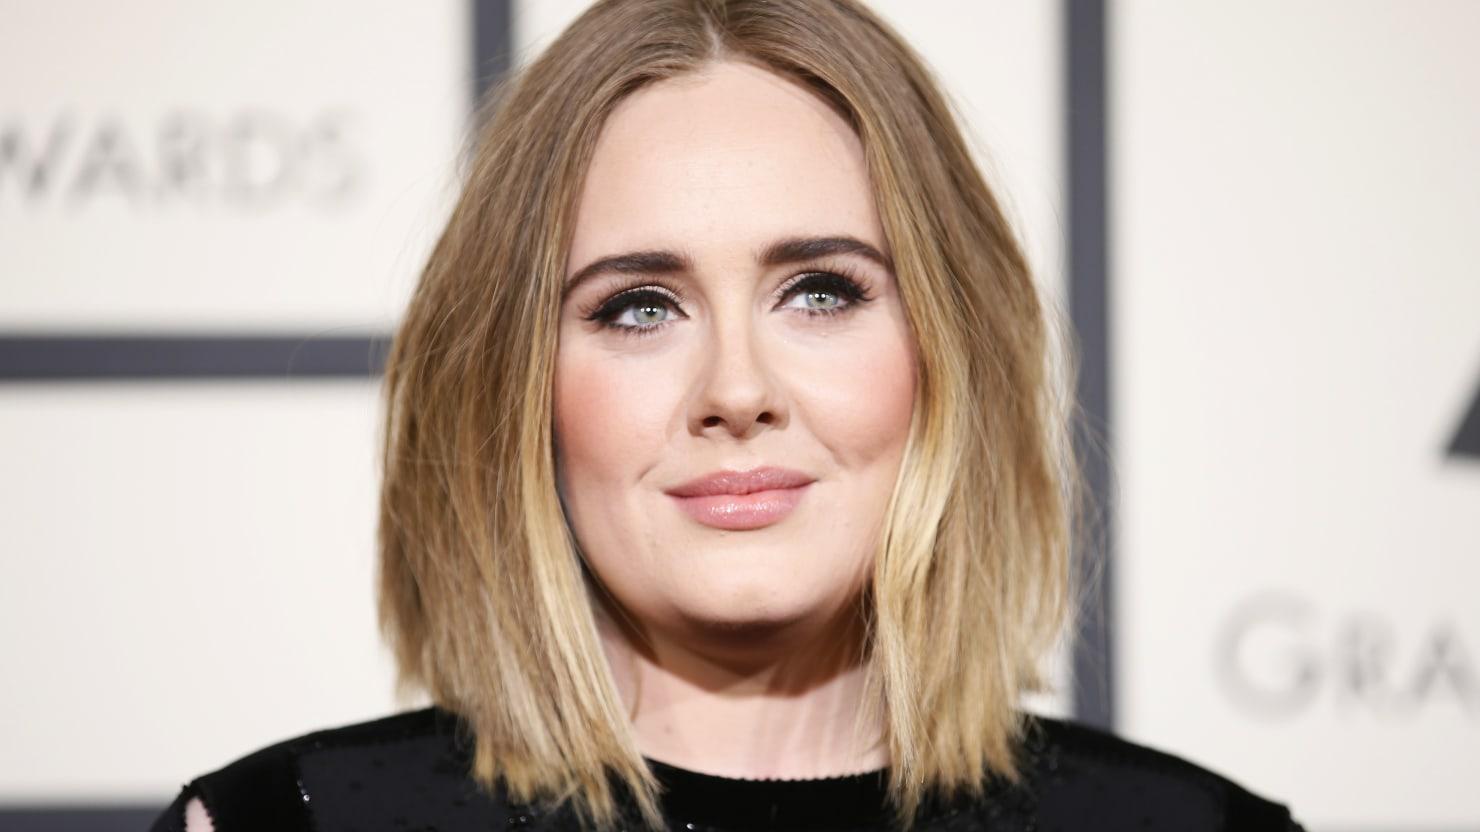 Singer Adele and Husband, Simon Konecki, Have Separated